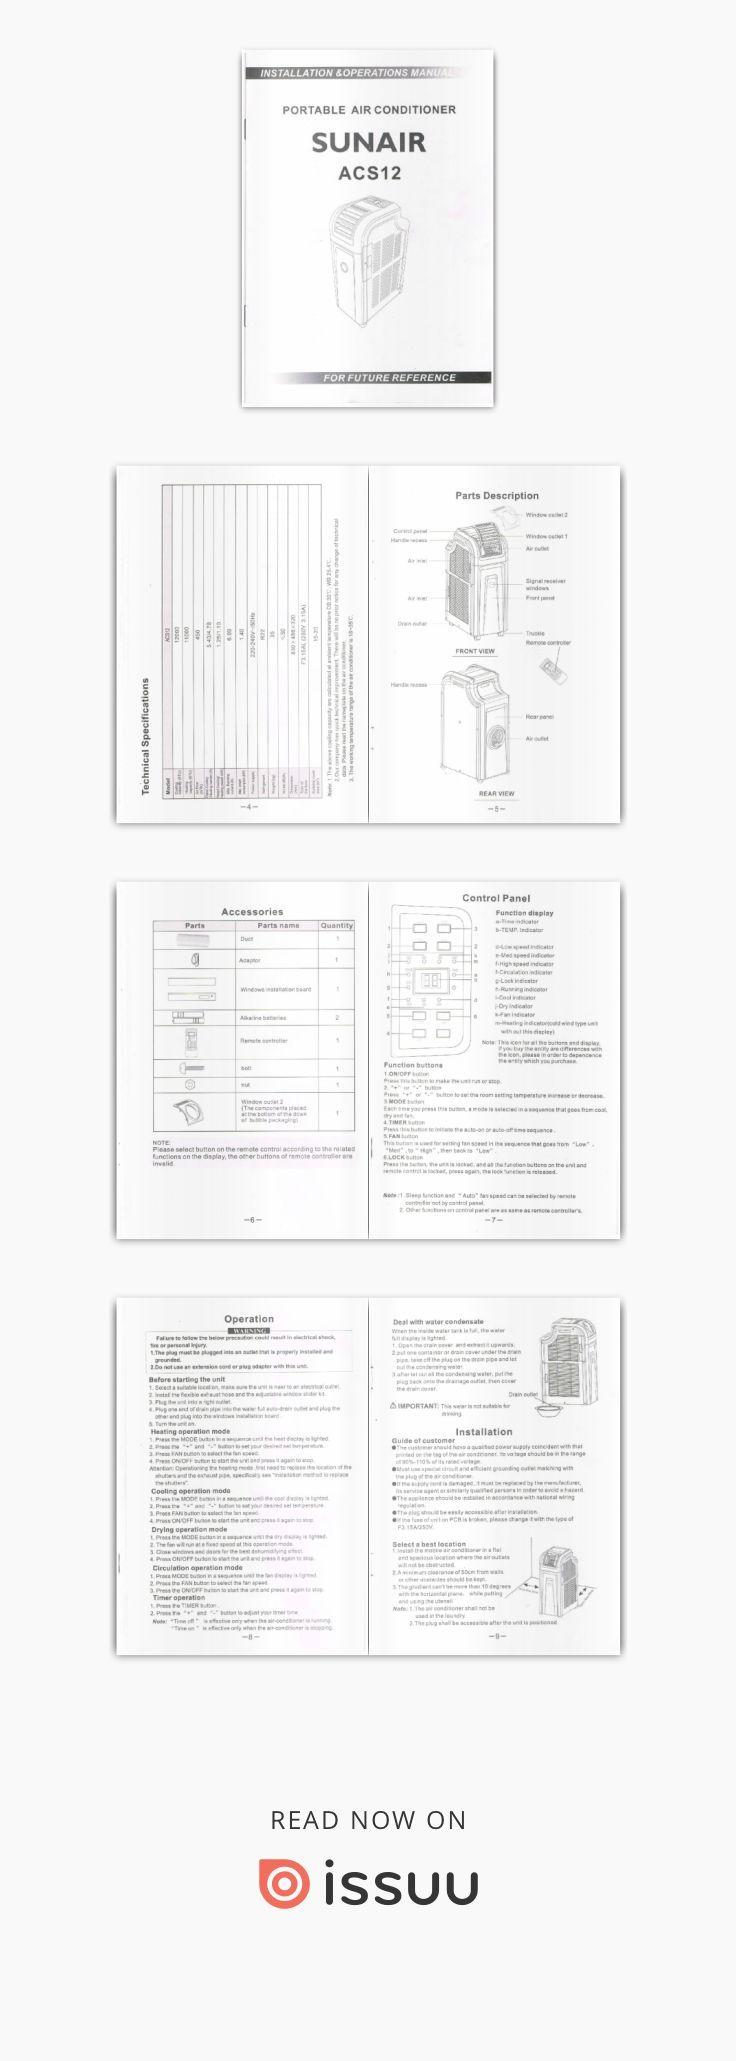 Sunair ACS12 Manual  Sunair Portable Airconditioner Reverse cycle Cooloing and Heating ACS12